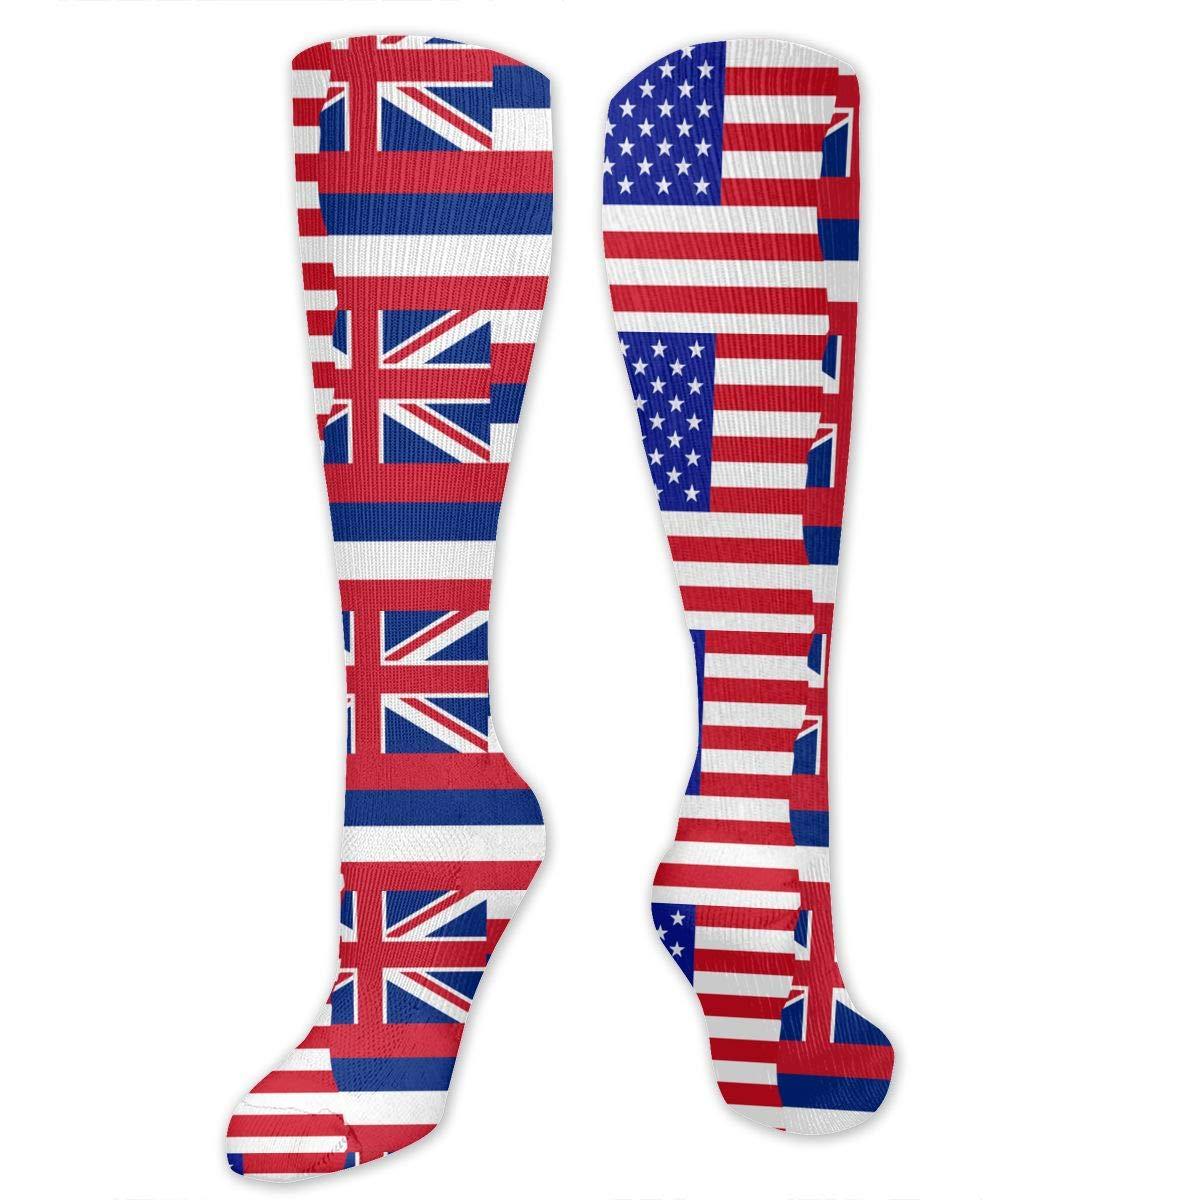 Unisex Half USA Half Hawaii State Flag Knee High Compression Thigh High Socks Tube Socks